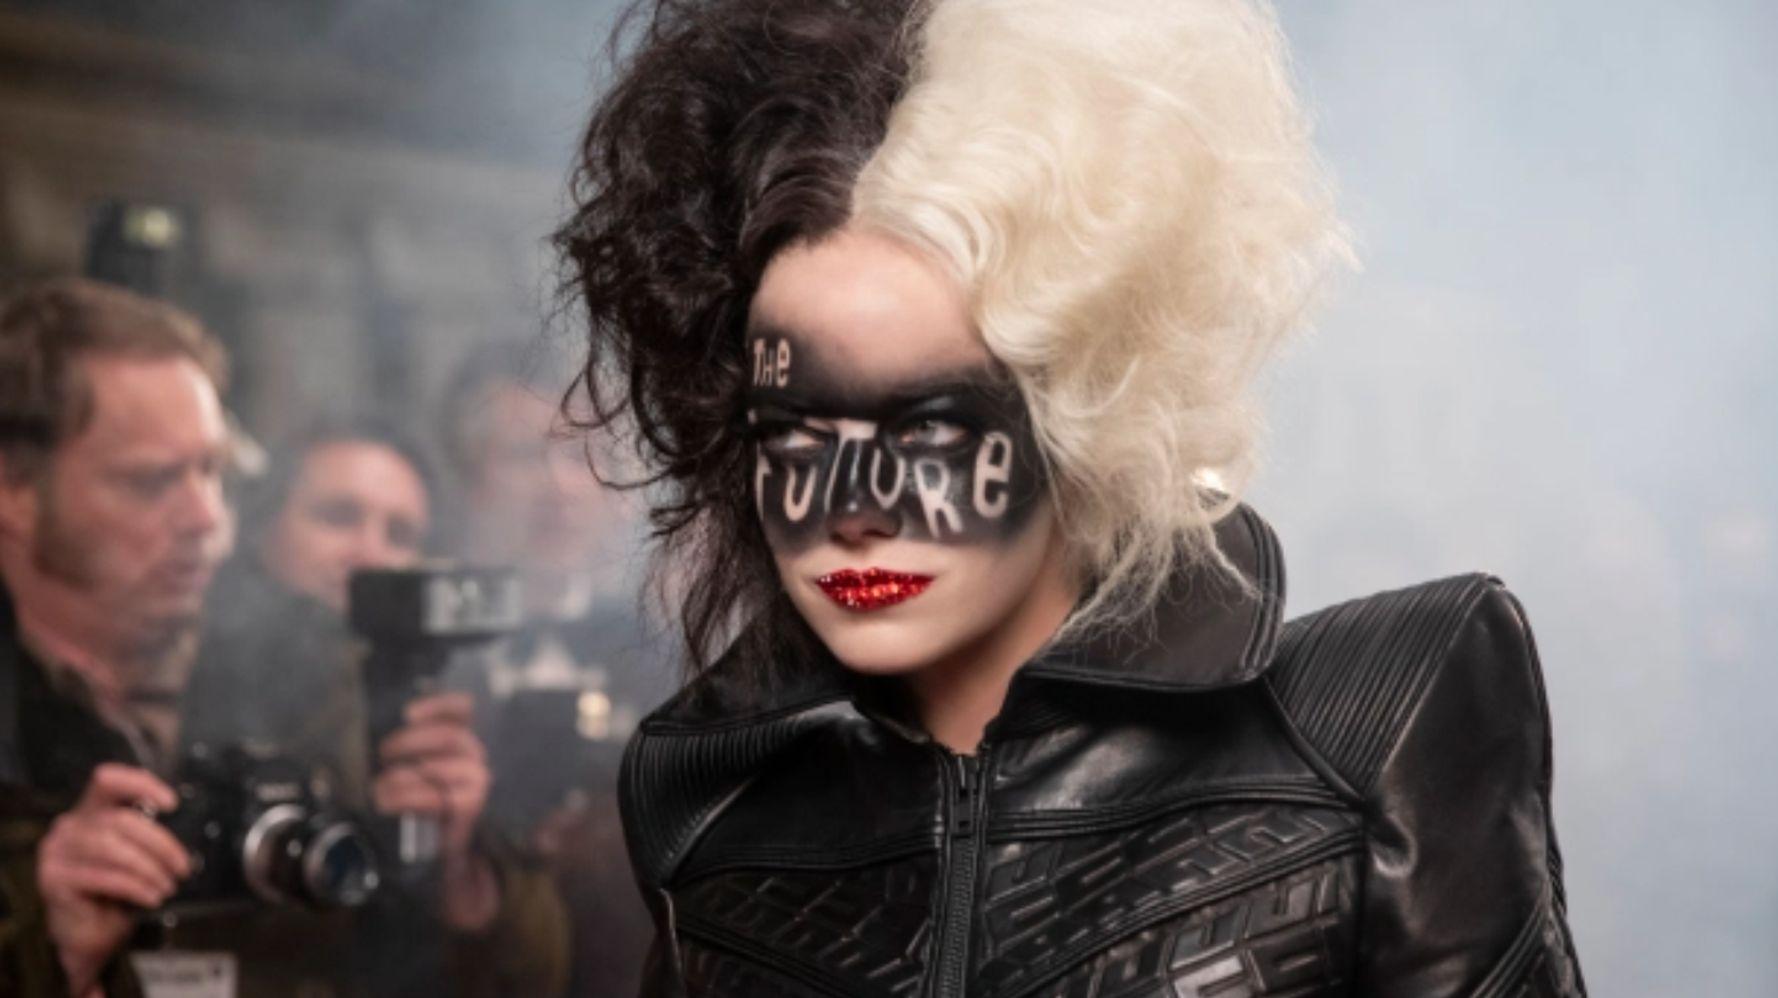 'Cruella' Sequel In The Works Even Though '101 Dalmatians' Already Exists